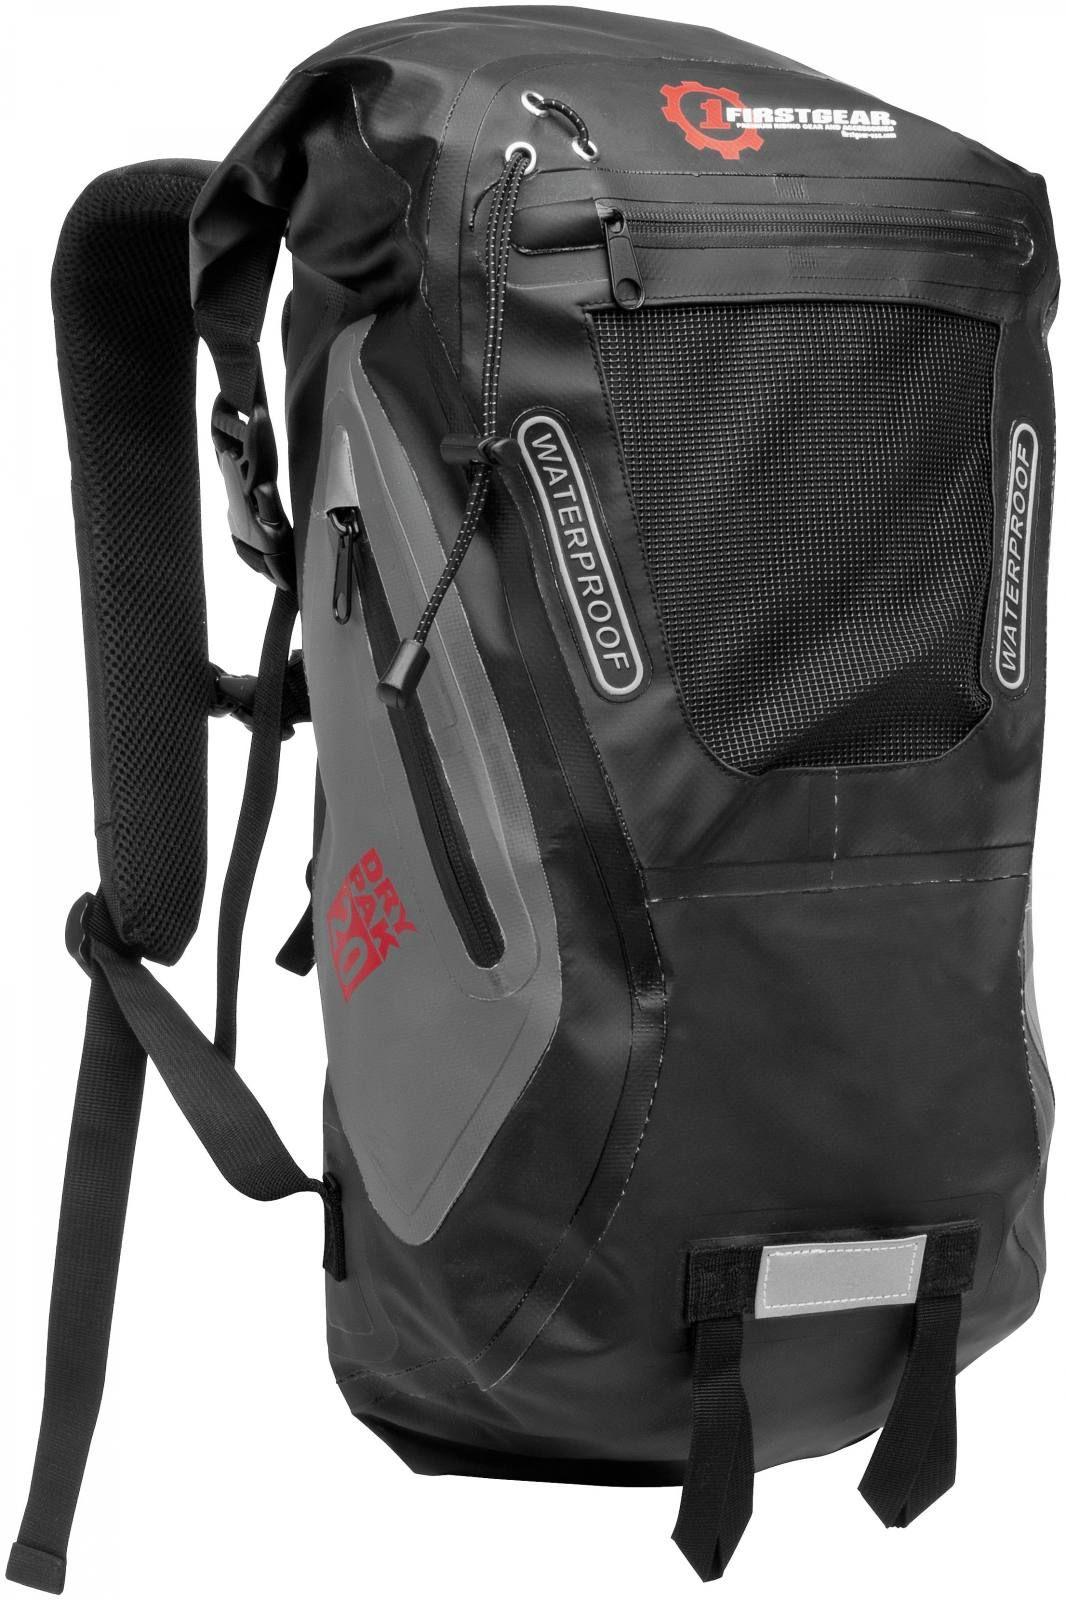 Torrent Waterproof 20 Liter Backpack for sale in Victoria, TX ...